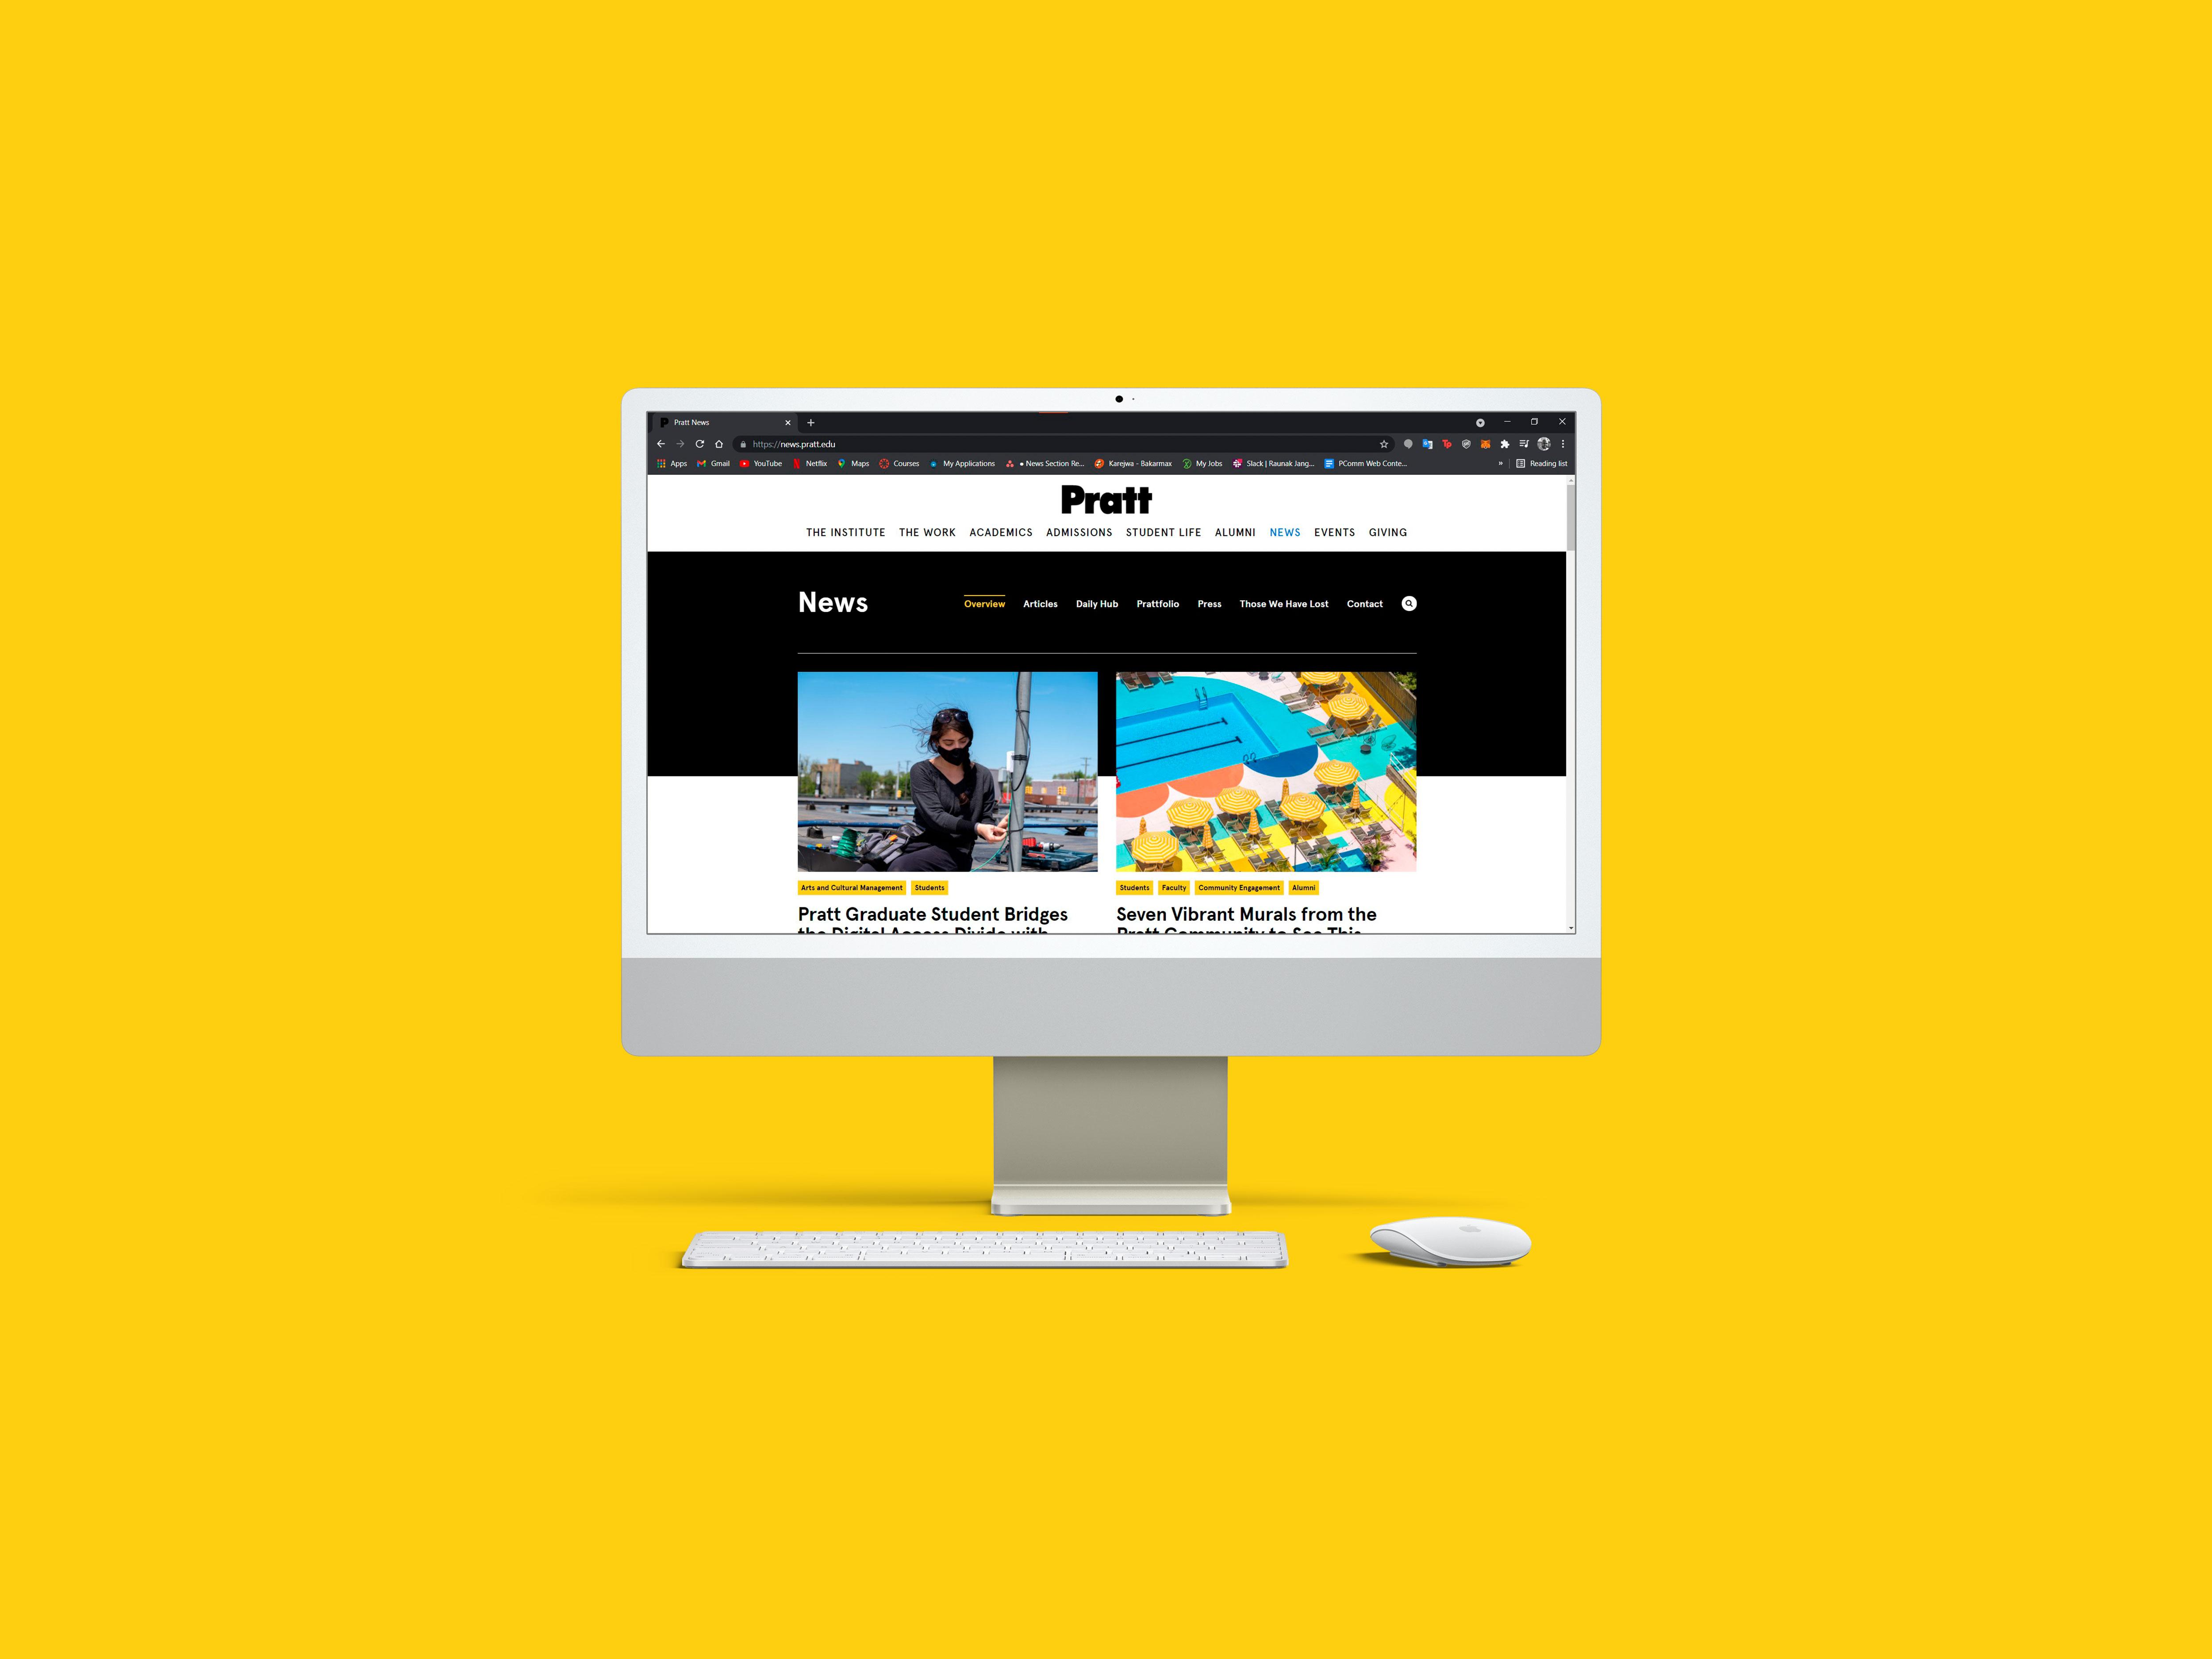 Desktop screen displaying the Pratt News website.